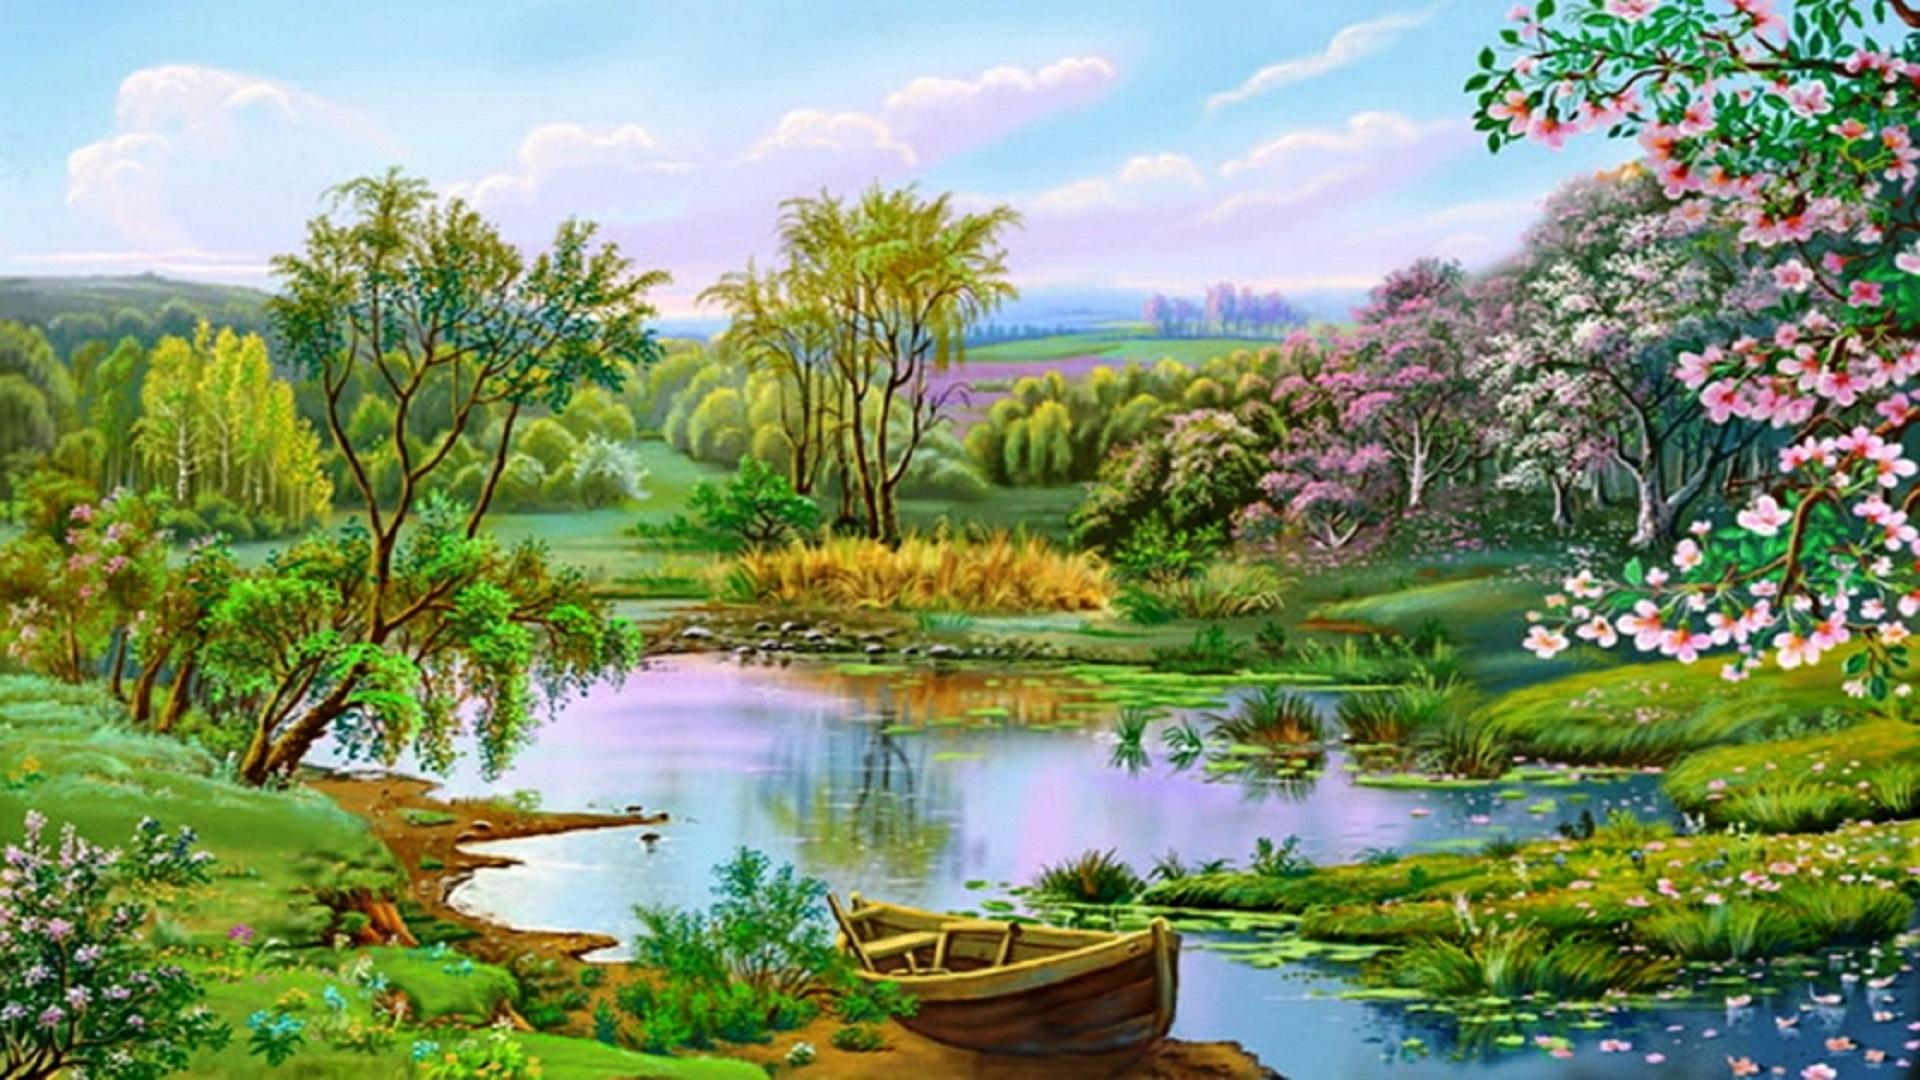 Fcd2dc82 Fre Hd Wallpapers For Garden - Flower Garden Hd Wallpaper Free Download , HD Wallpaper & Backgrounds